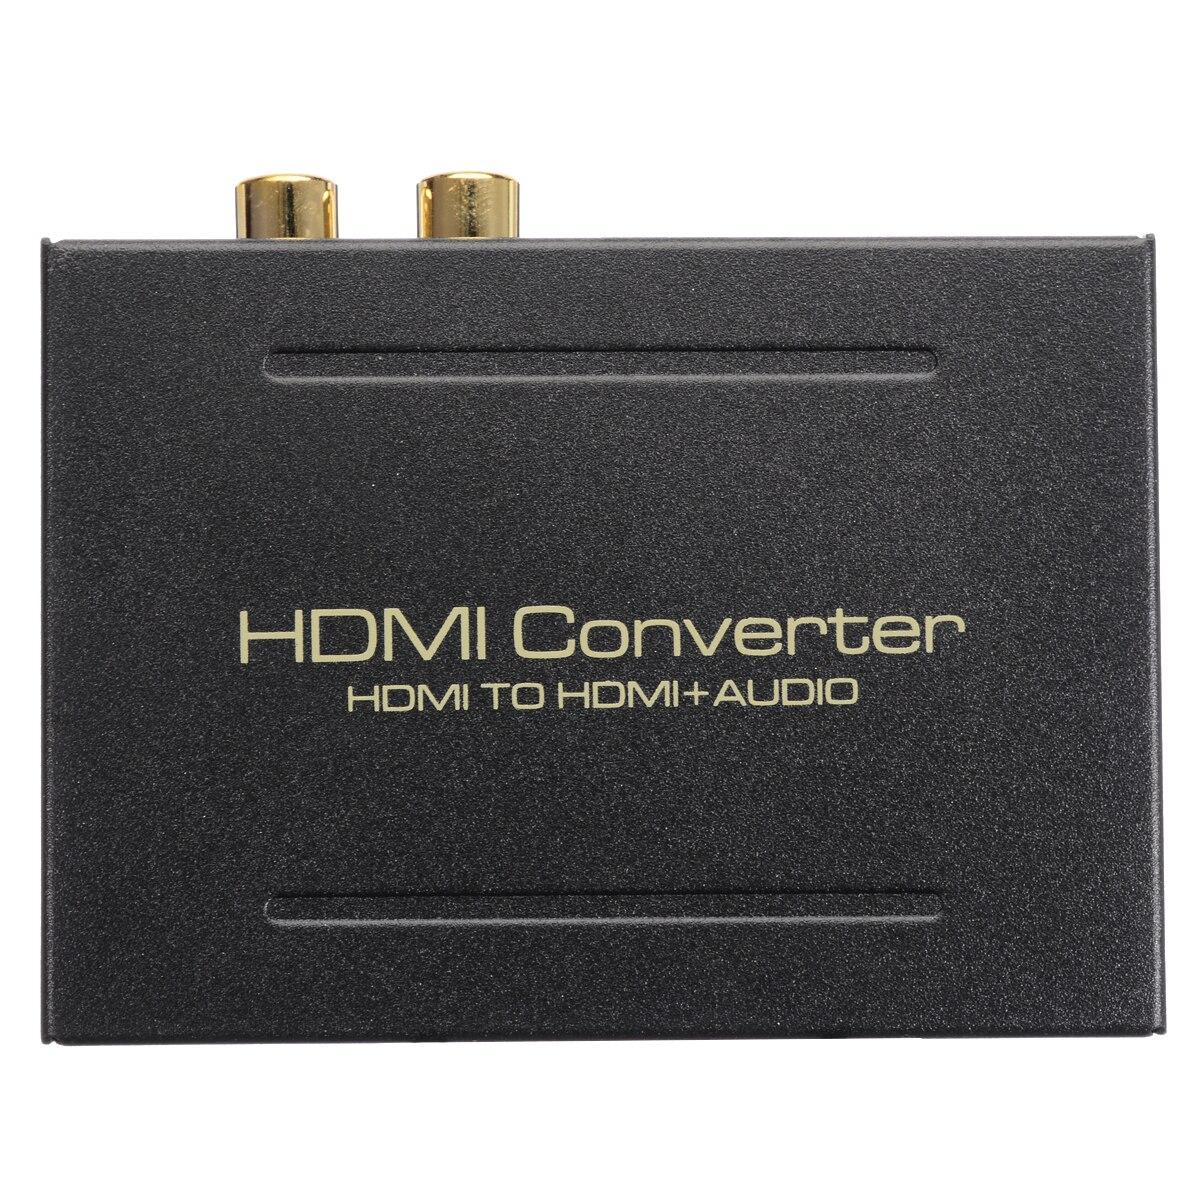 Conversor de áudio do extrator de hdmi 5.1ch divisor de áudio 1080 p estéreo analógico hdmi para hdmi spdif ótico rca l/r adaptador conversores